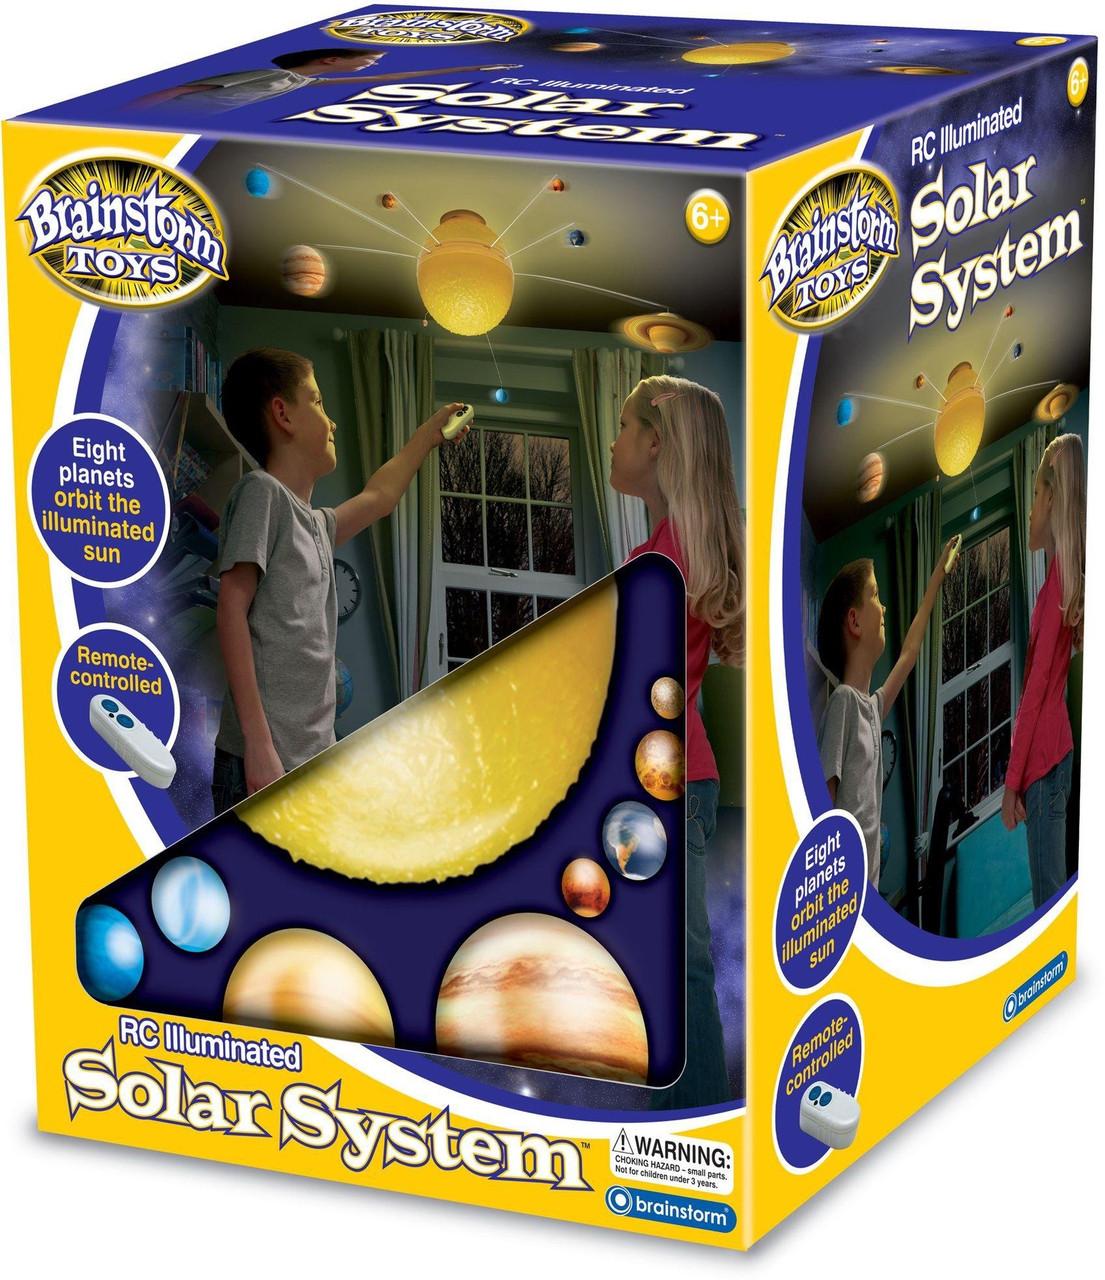 MY VERY OWN SOLAR SYSTEM